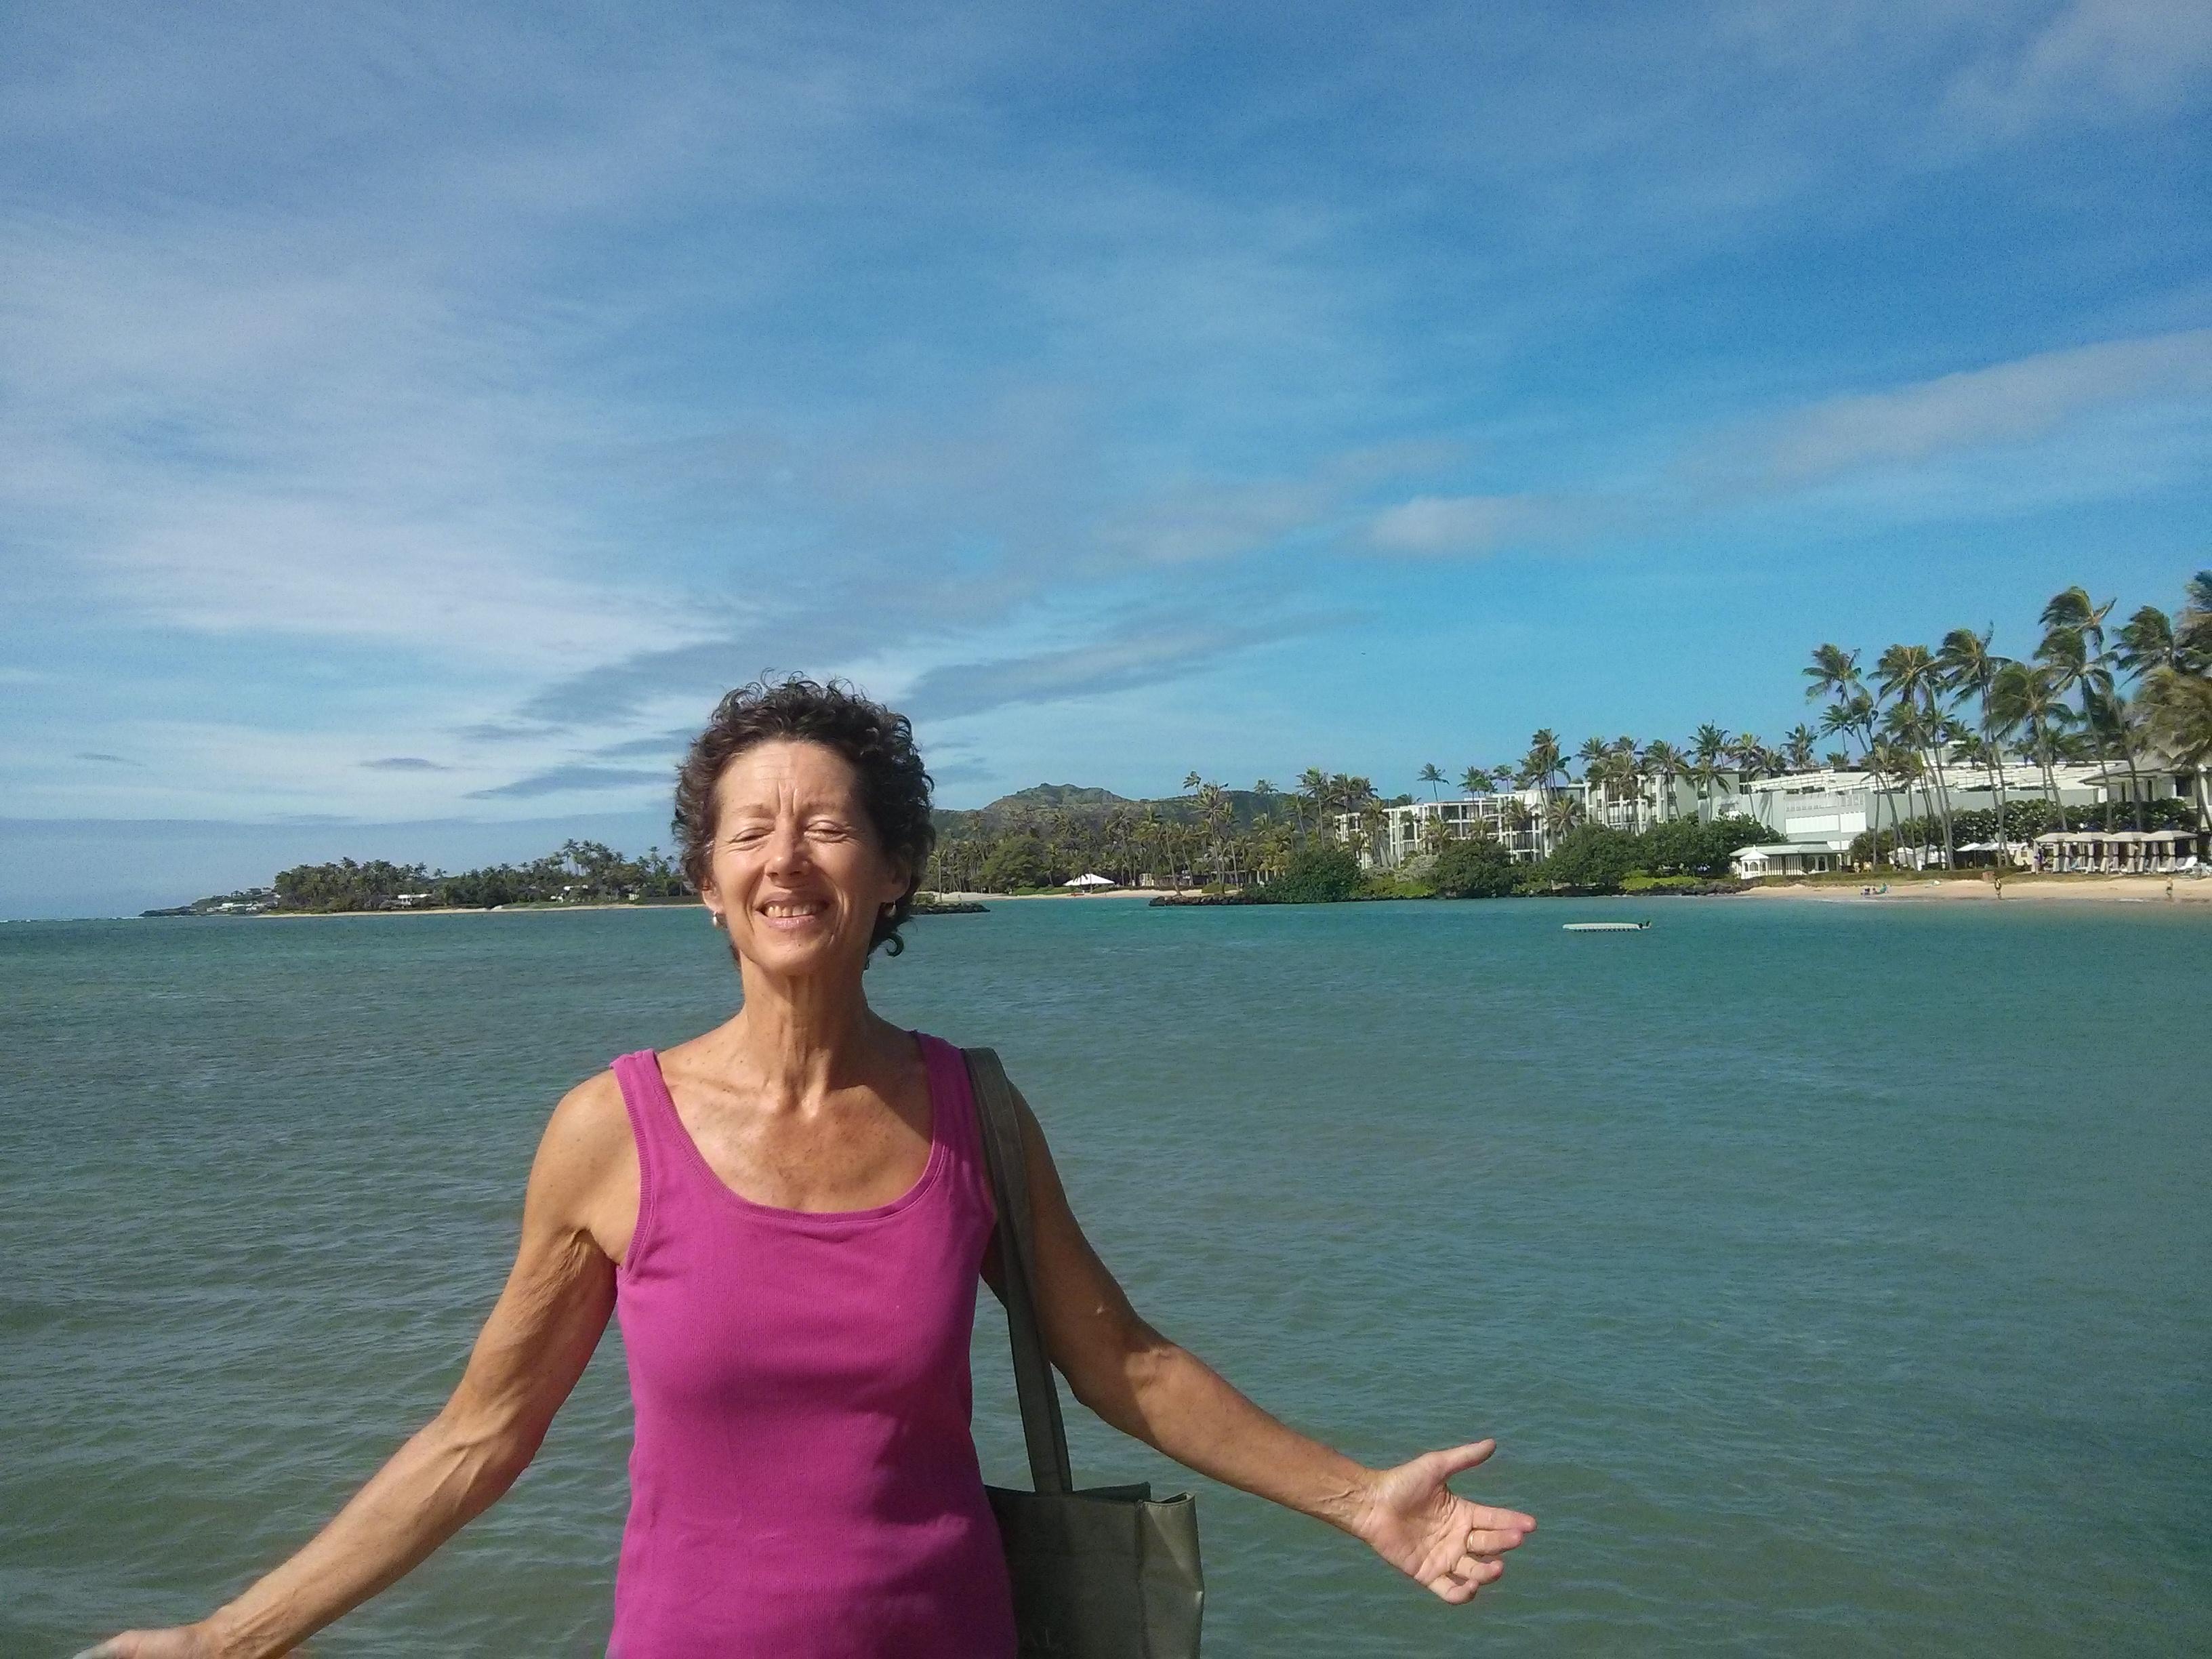 Nancy embracing Hawaii strong sun and wind